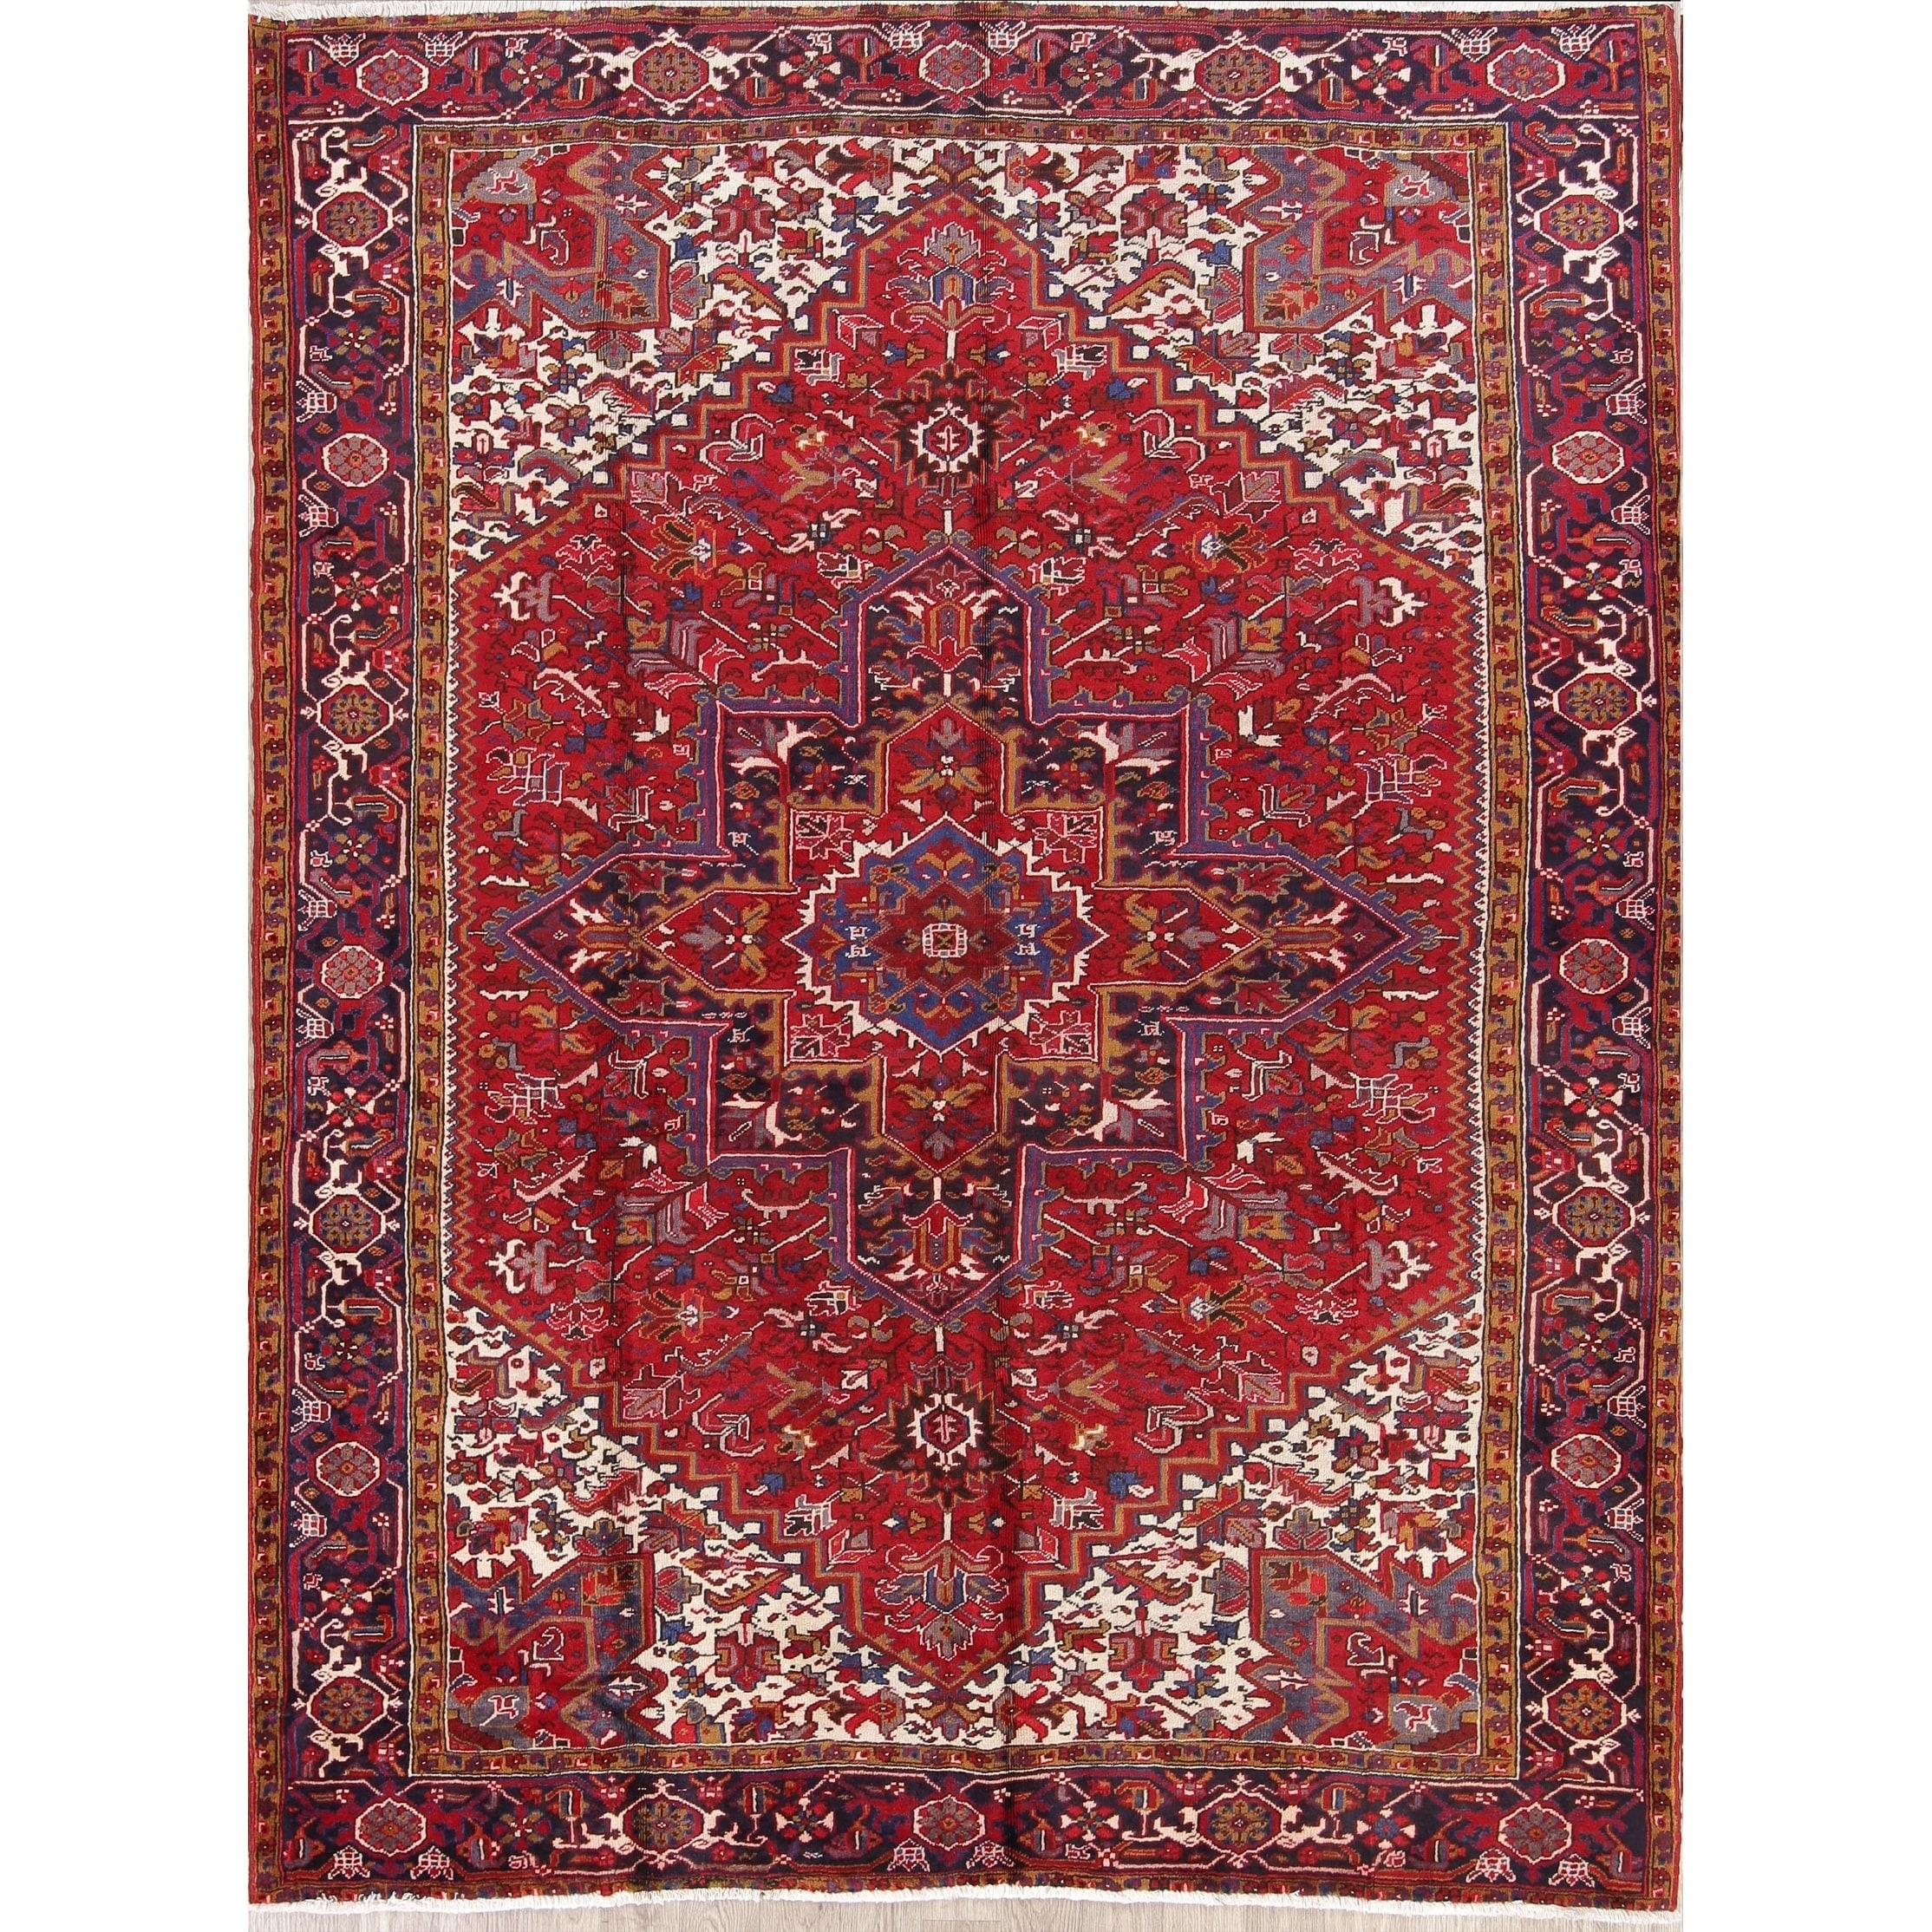 Vintage Handmade Oriental Heriz Serapi Red Persian Carpet Area Rug 11 2 X 8 5